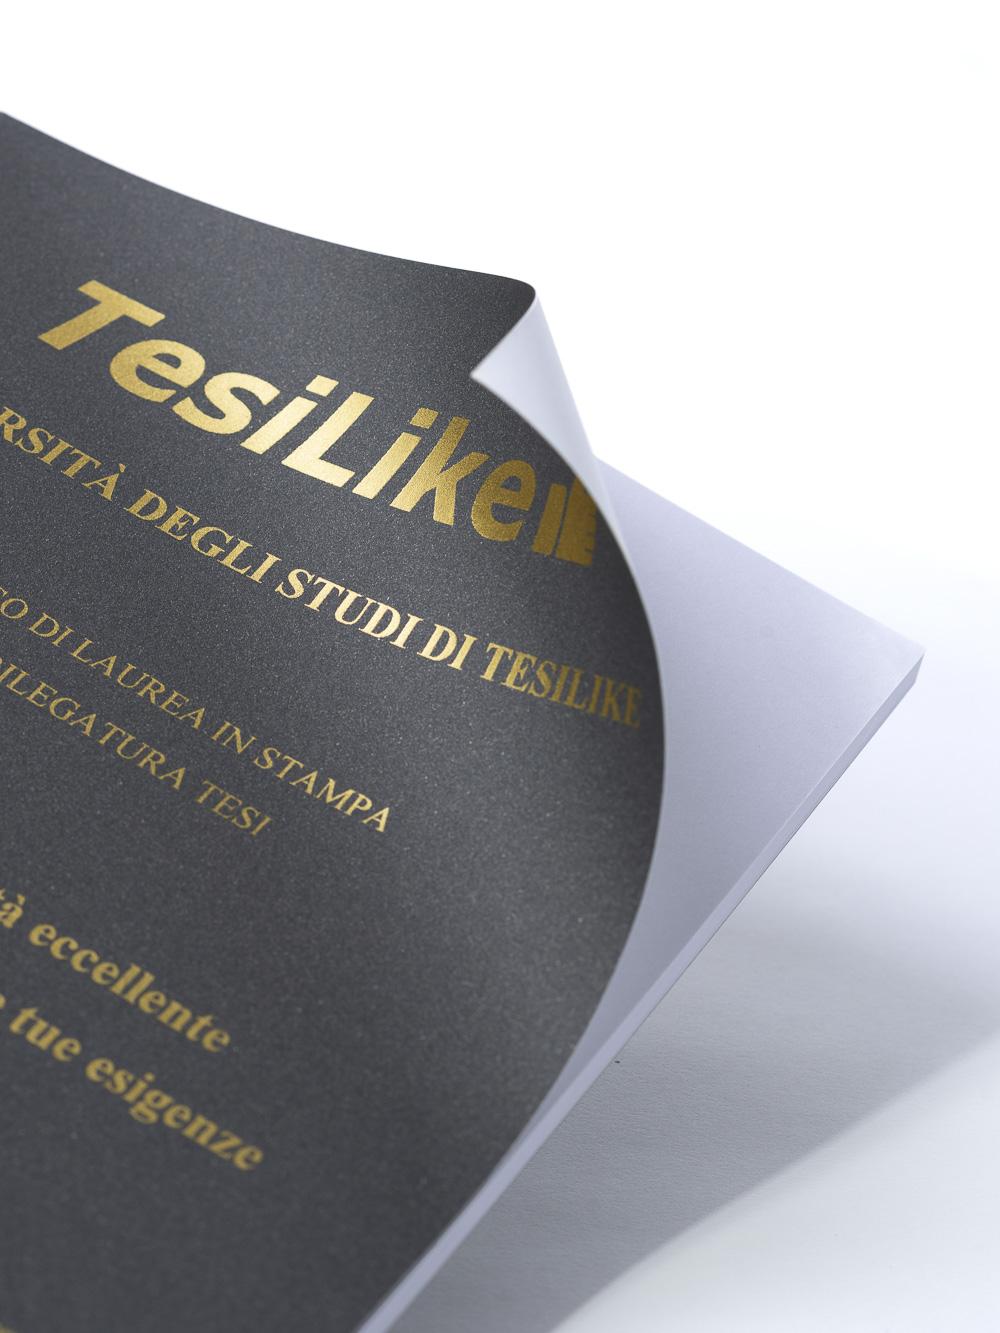 copertina-tesi-flessibile-grigia-frontespizio-oro-dettaglio3-tesilike